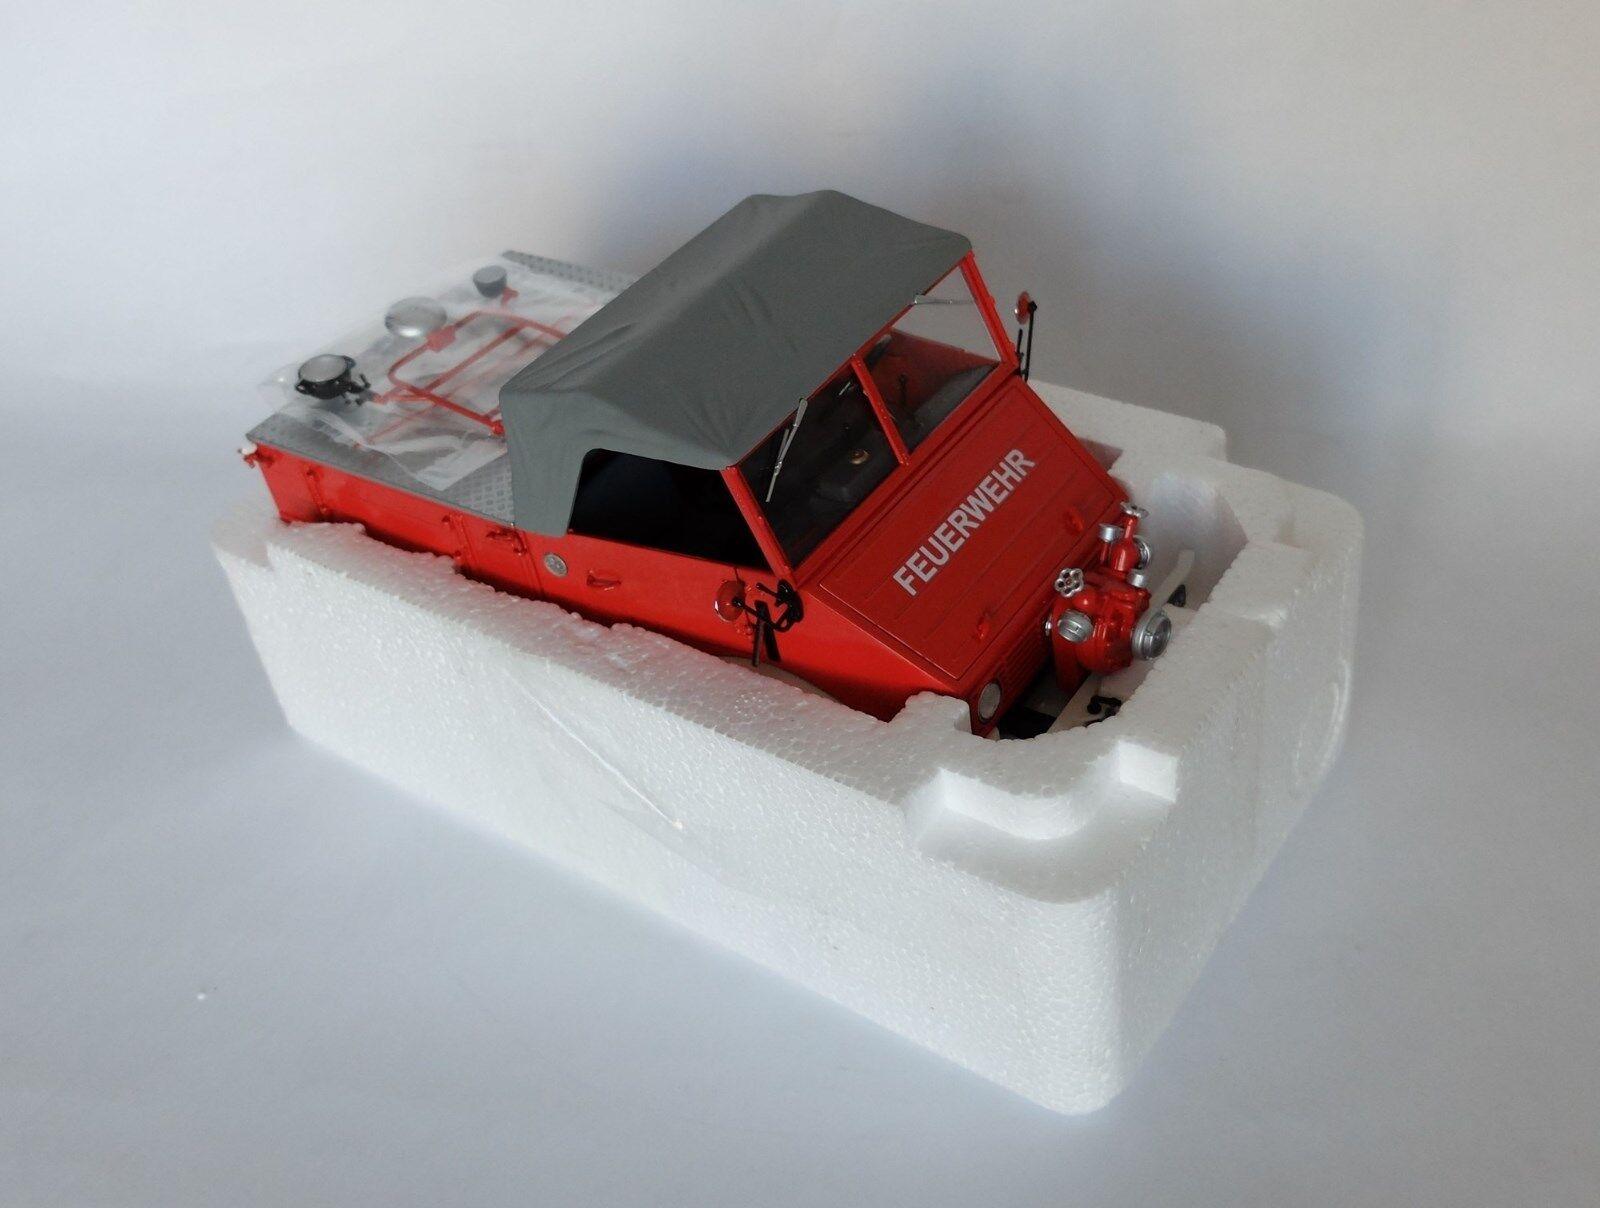 Schuco 1 18 - Unimog 401 bomberos